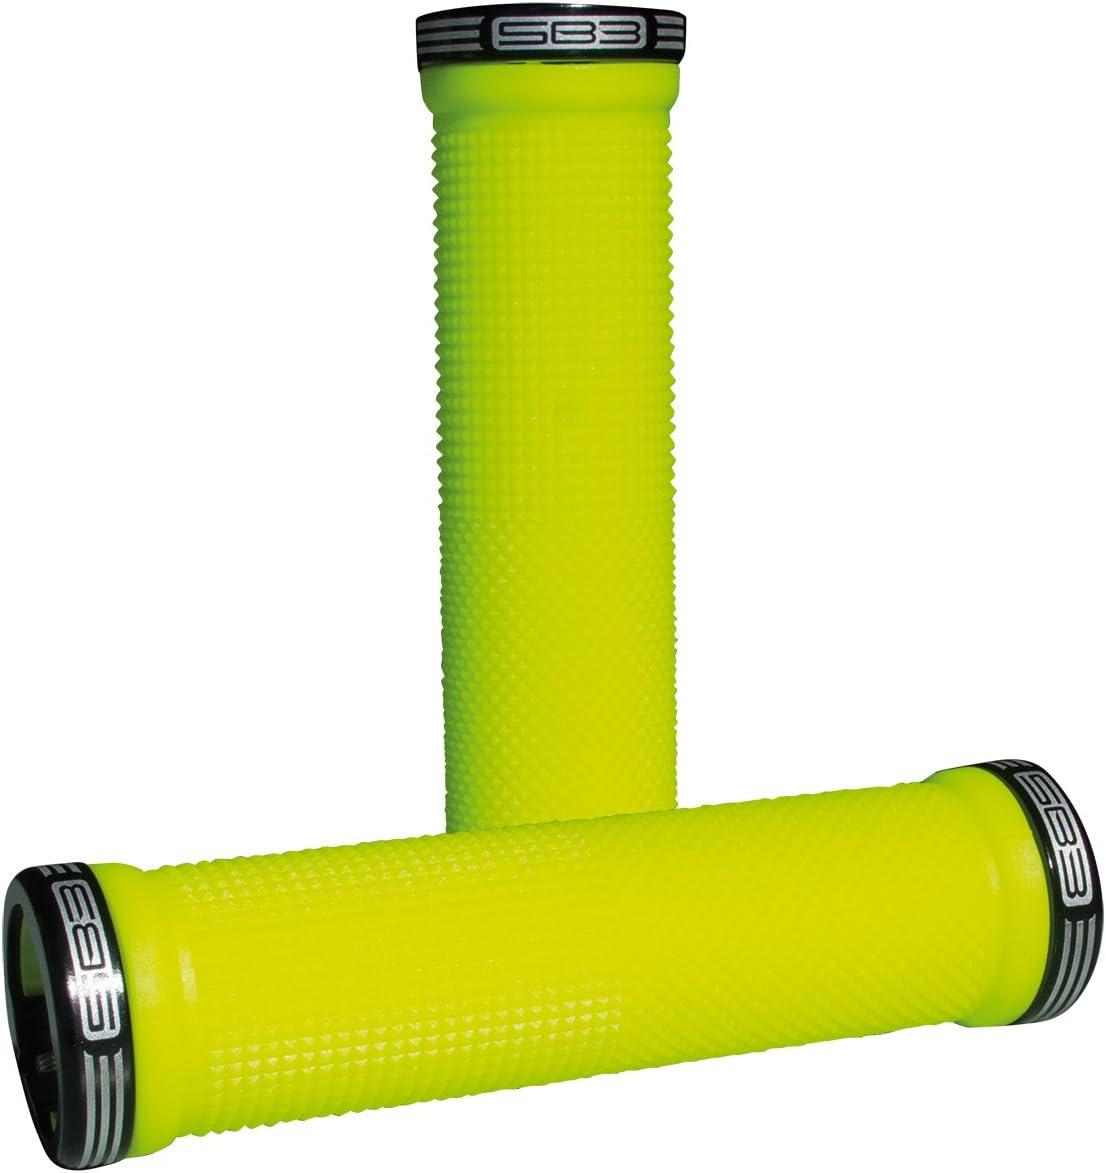 Neon Yellow SB3/Kheops Grips Pair of Grips Unisex Adult